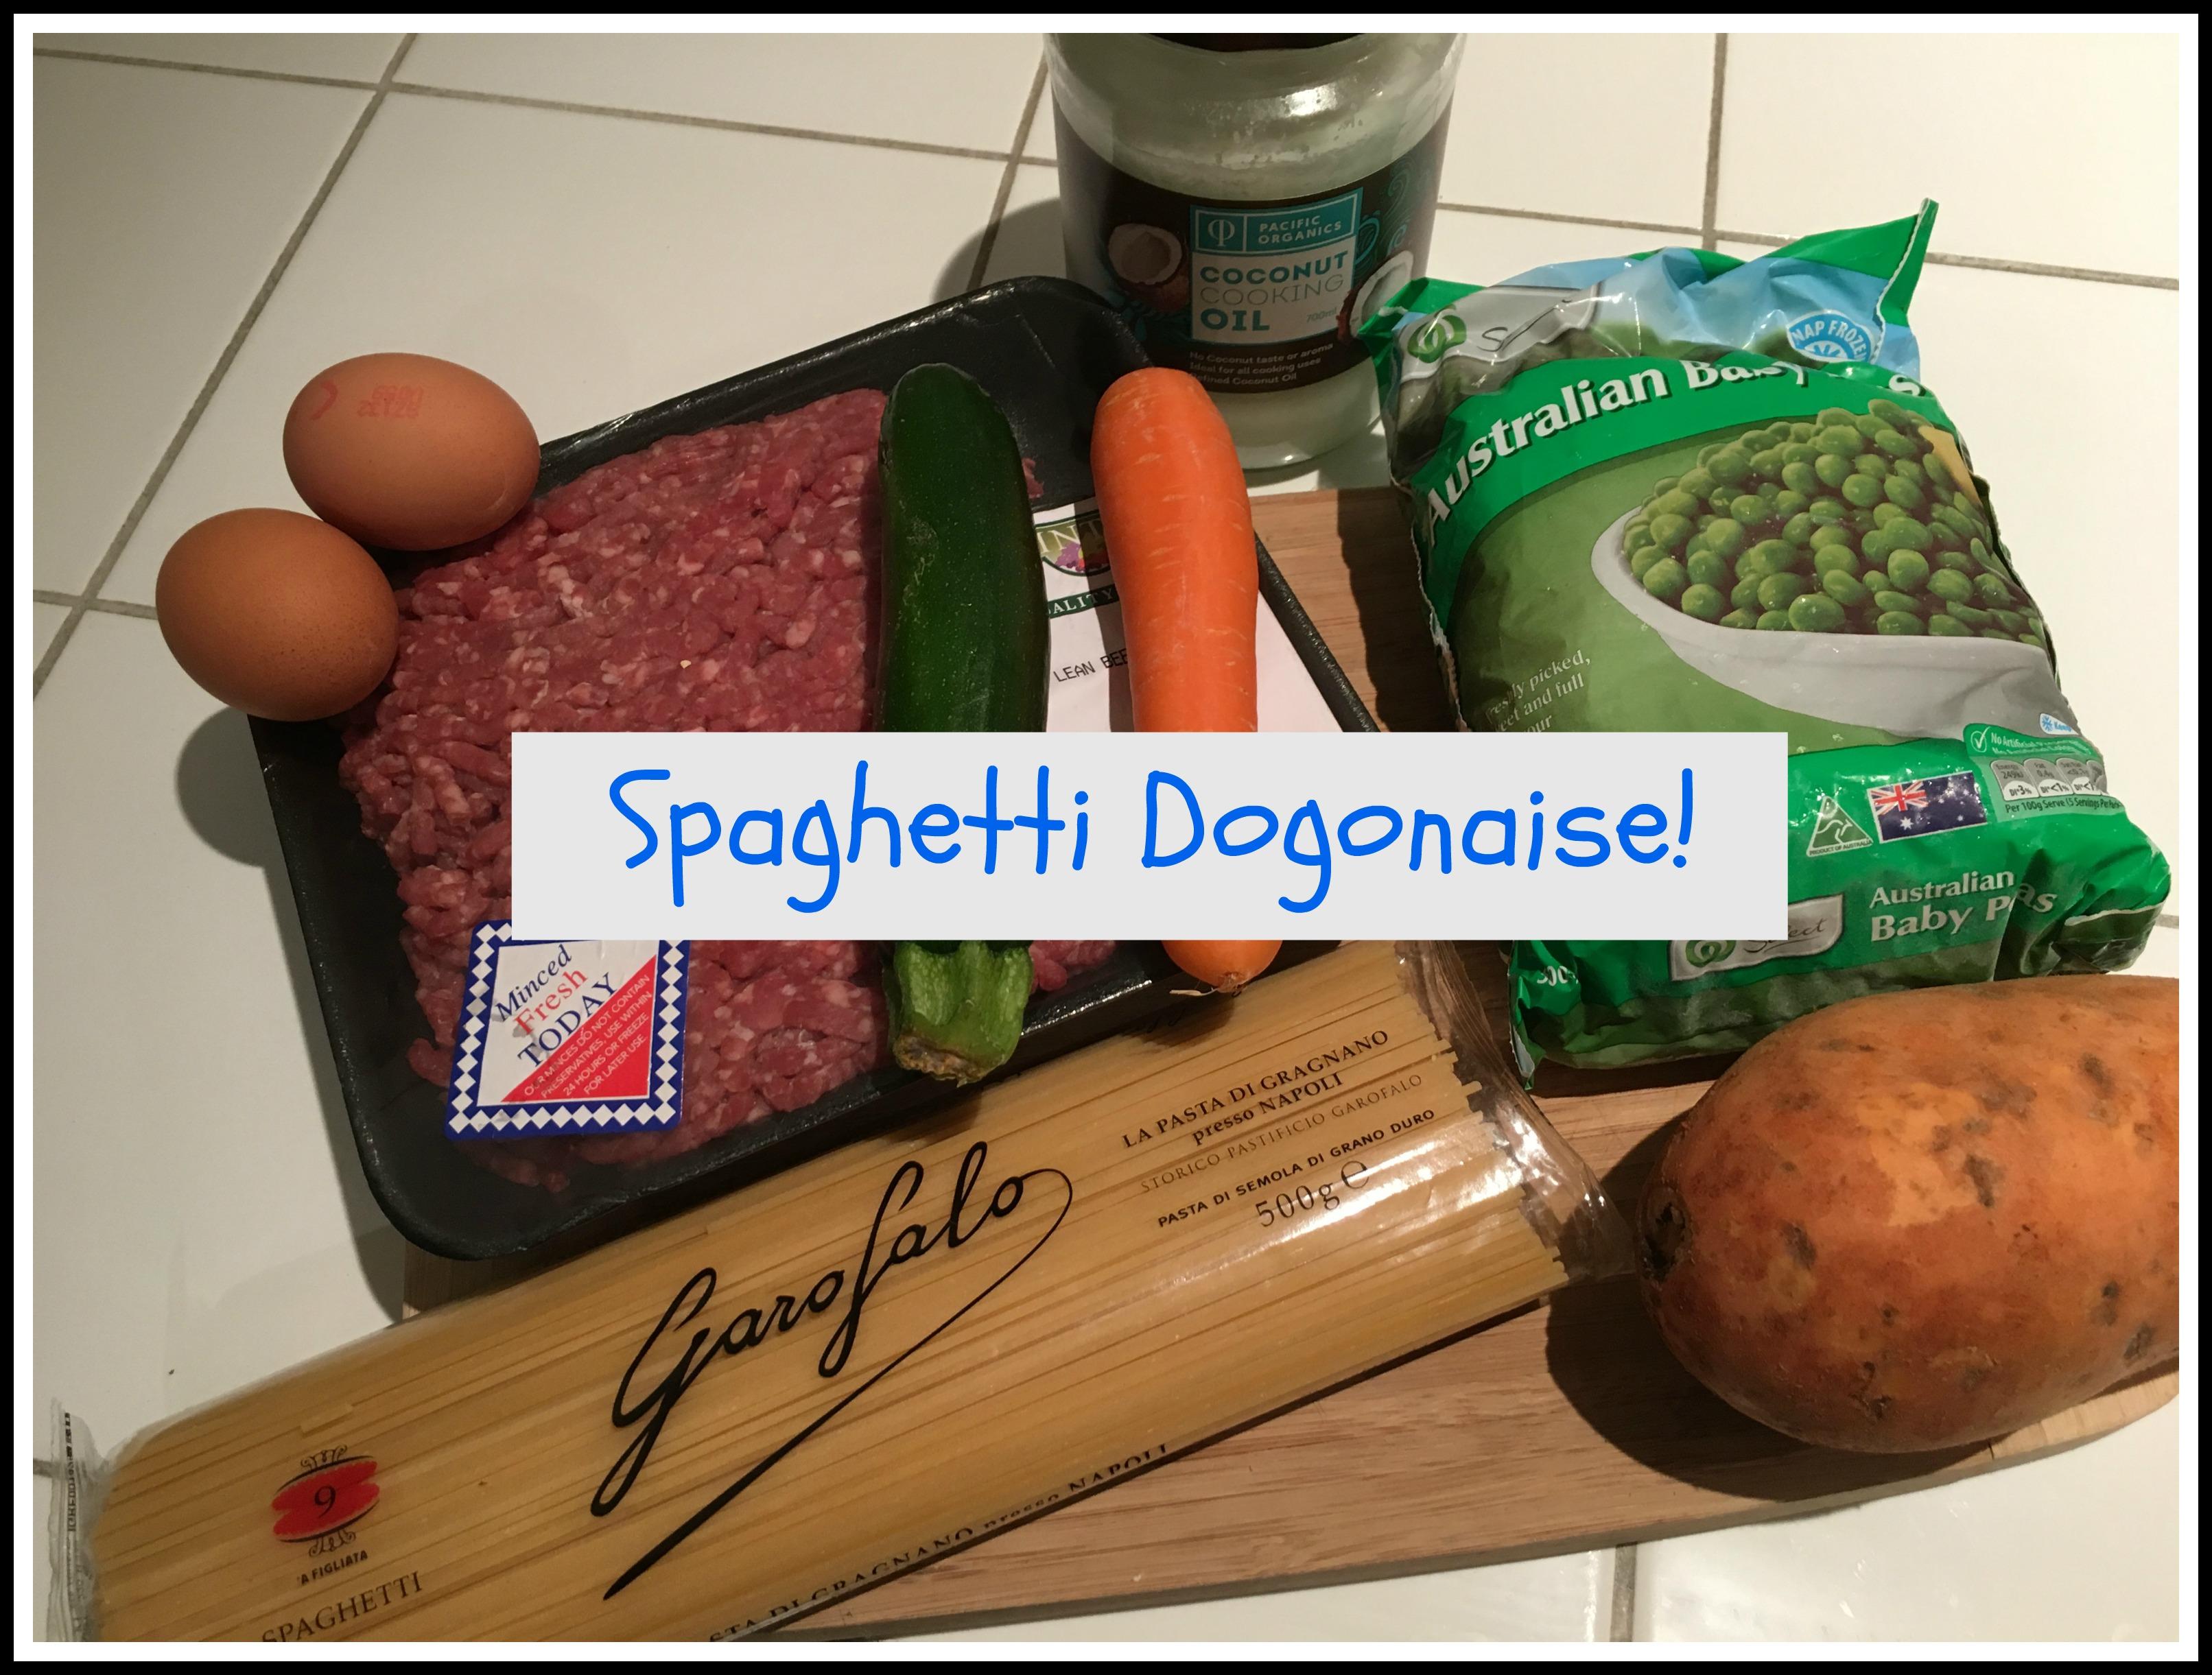 Spaghetti Dogonaise